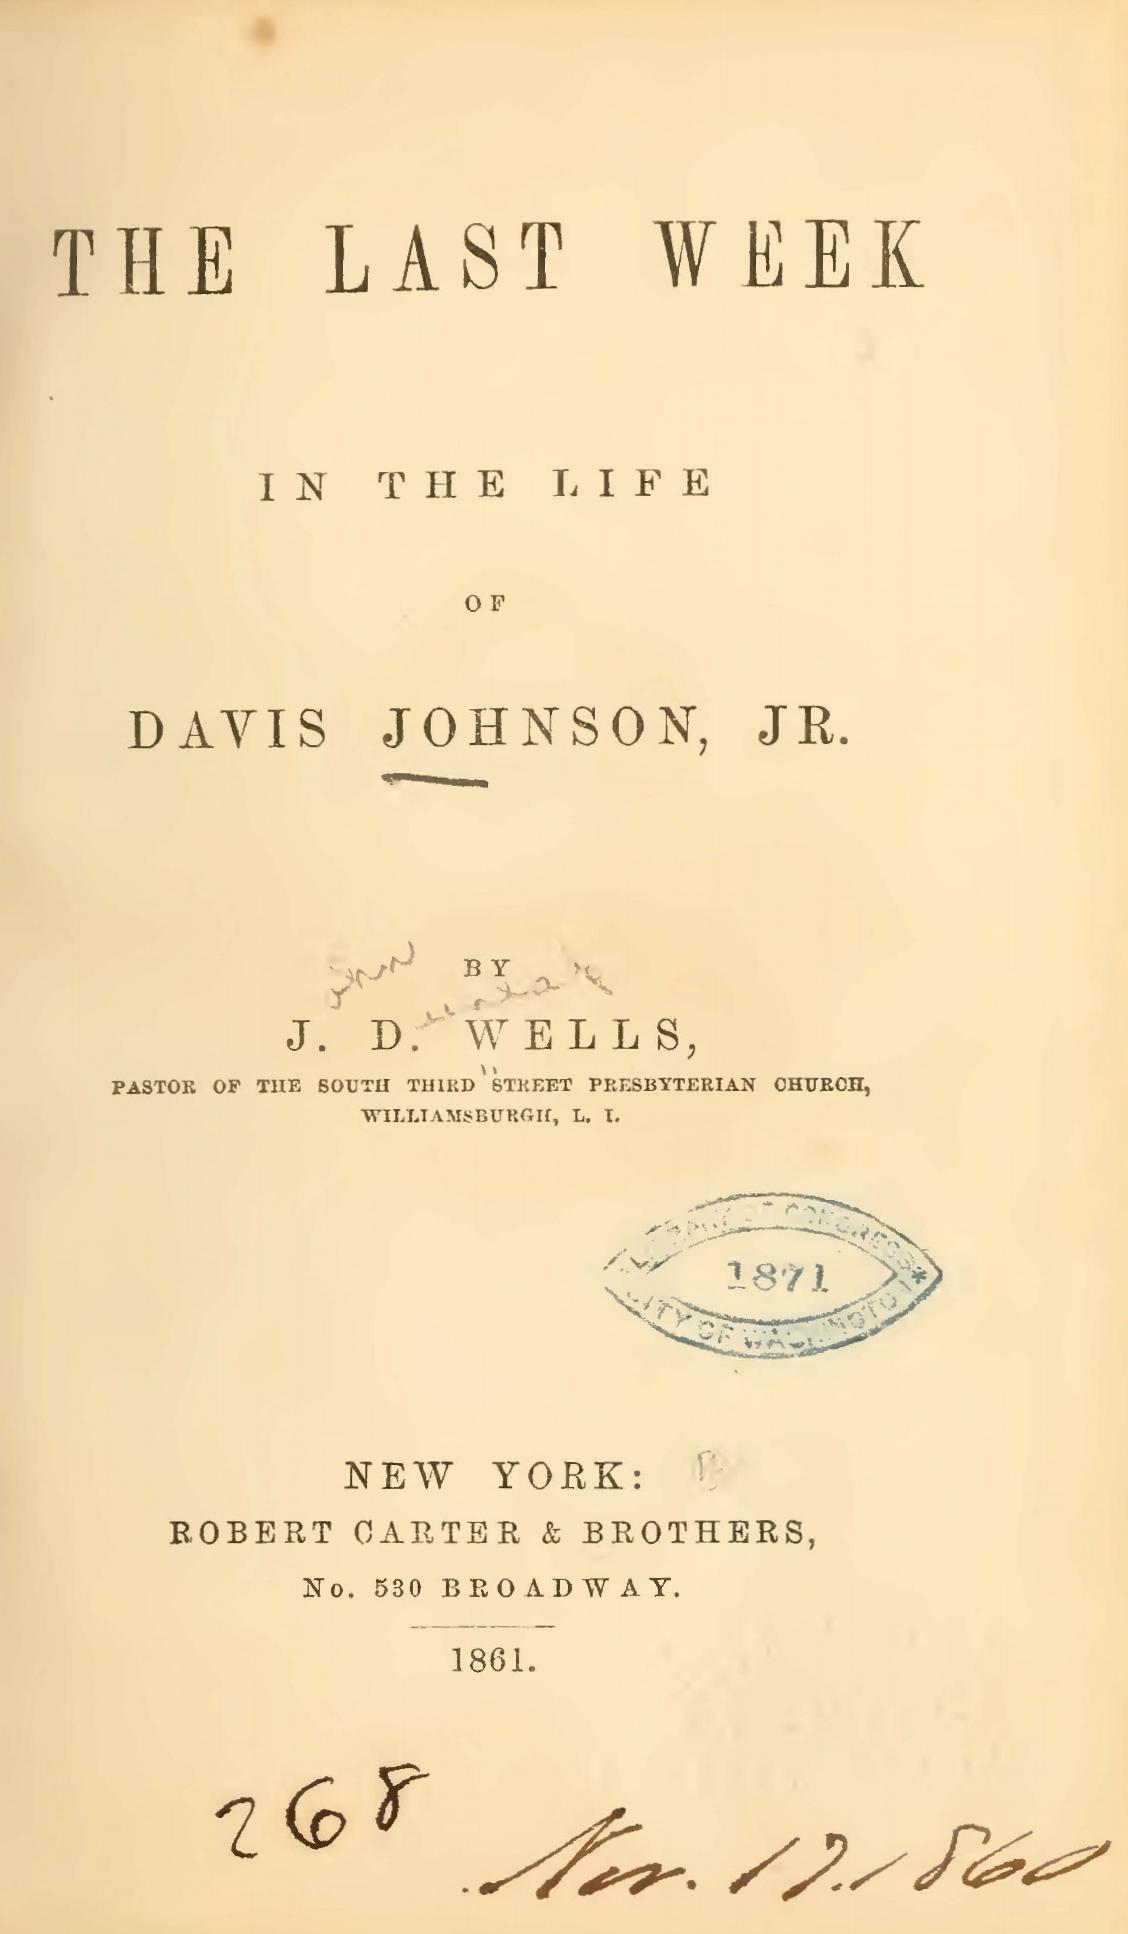 Wells, John Dunlap, The Last Week in the Life of Davis Johnson, Jr. Title Page.jpg